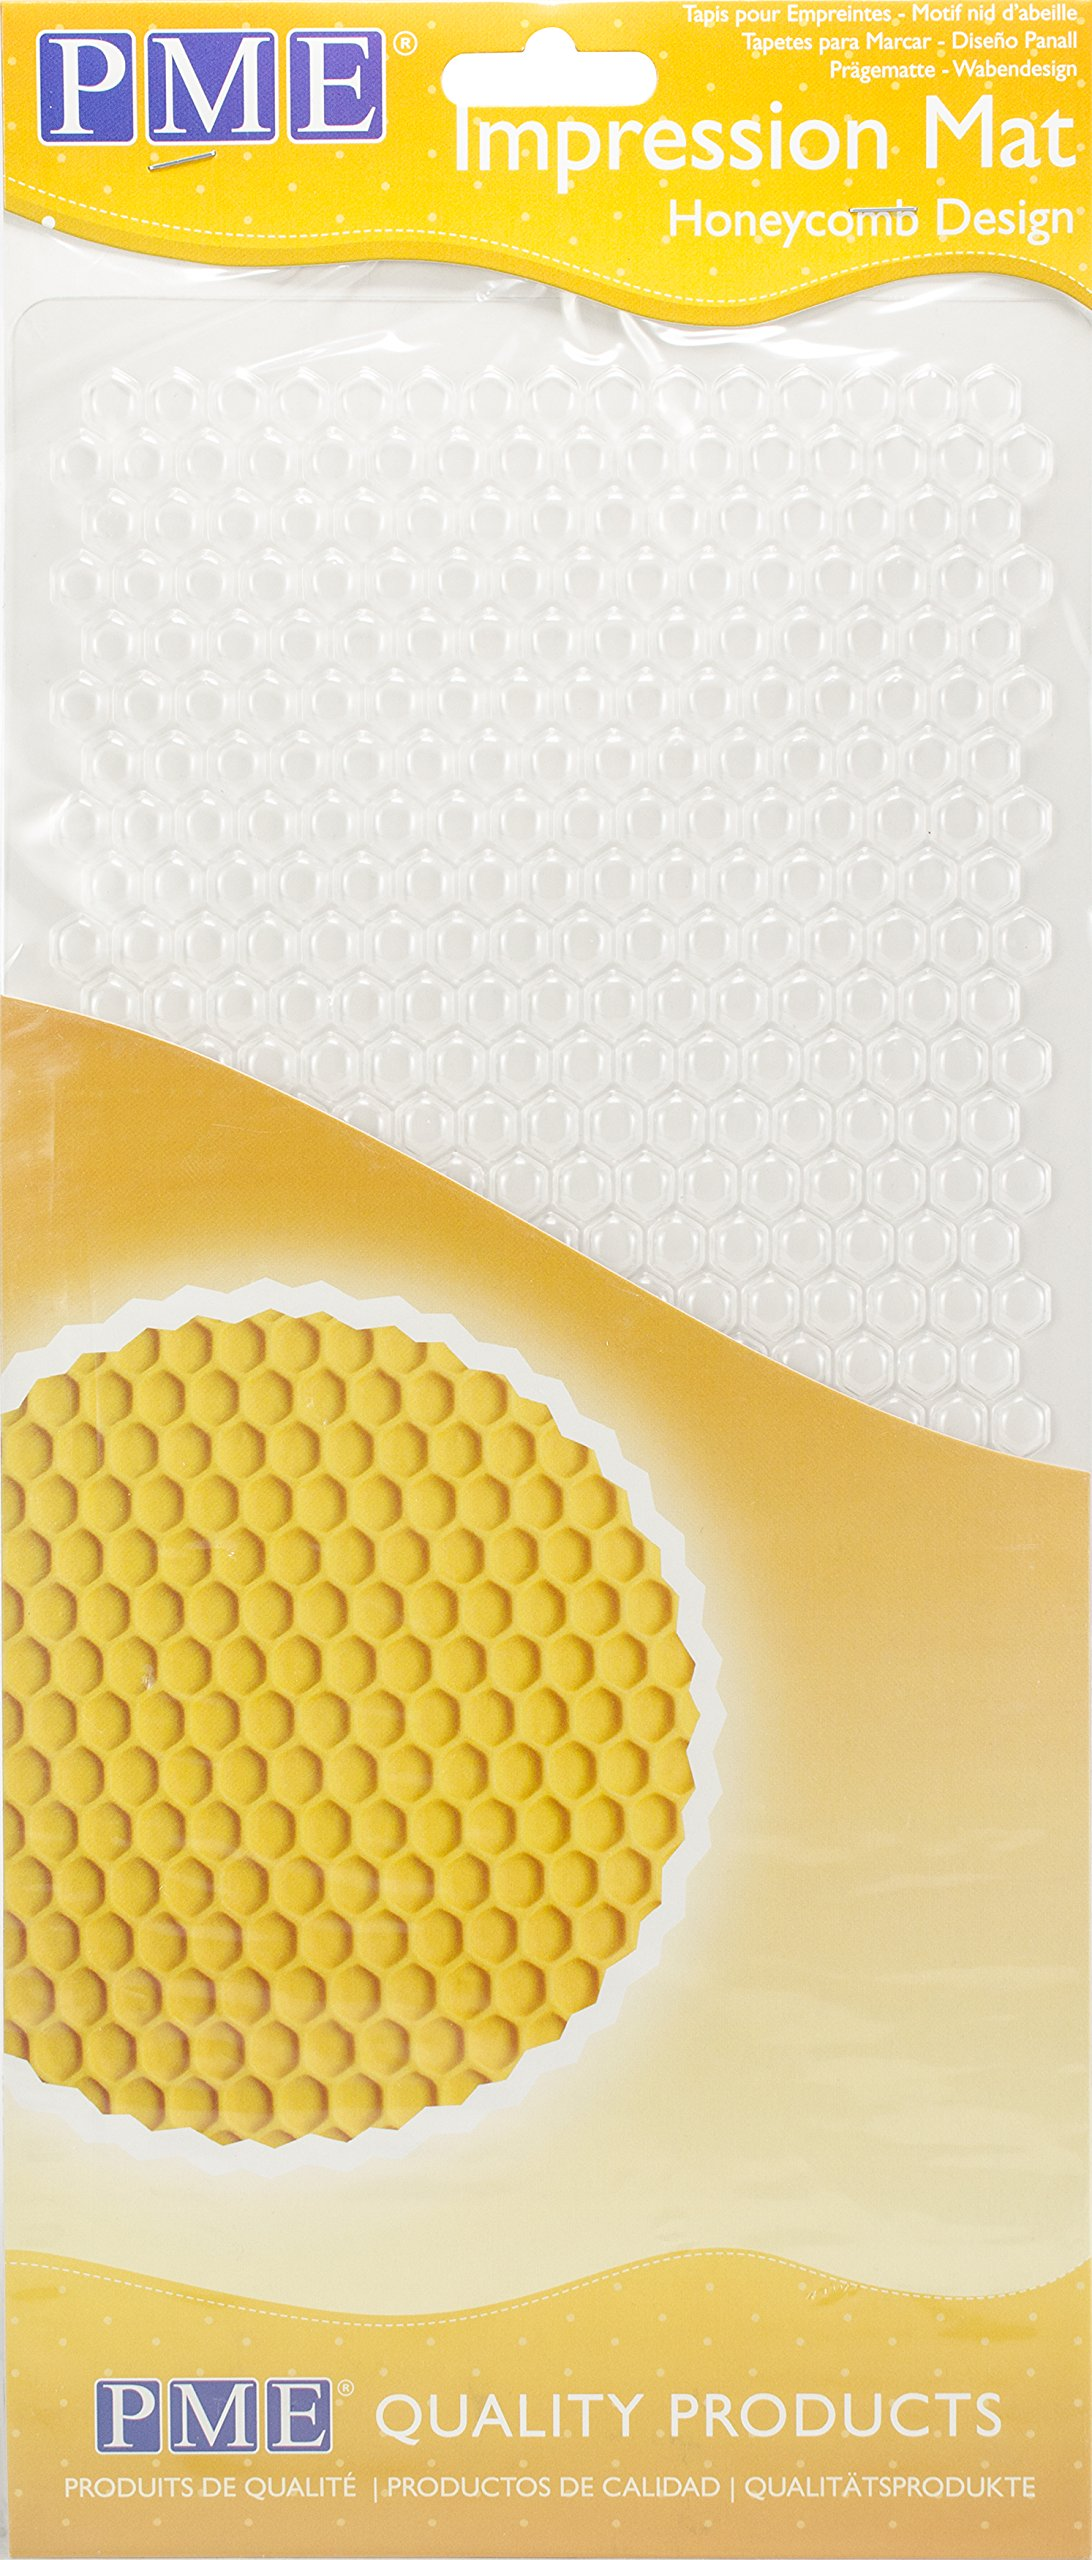 PME Honeycomb Design, Impression Mat, 12 x 6-inch